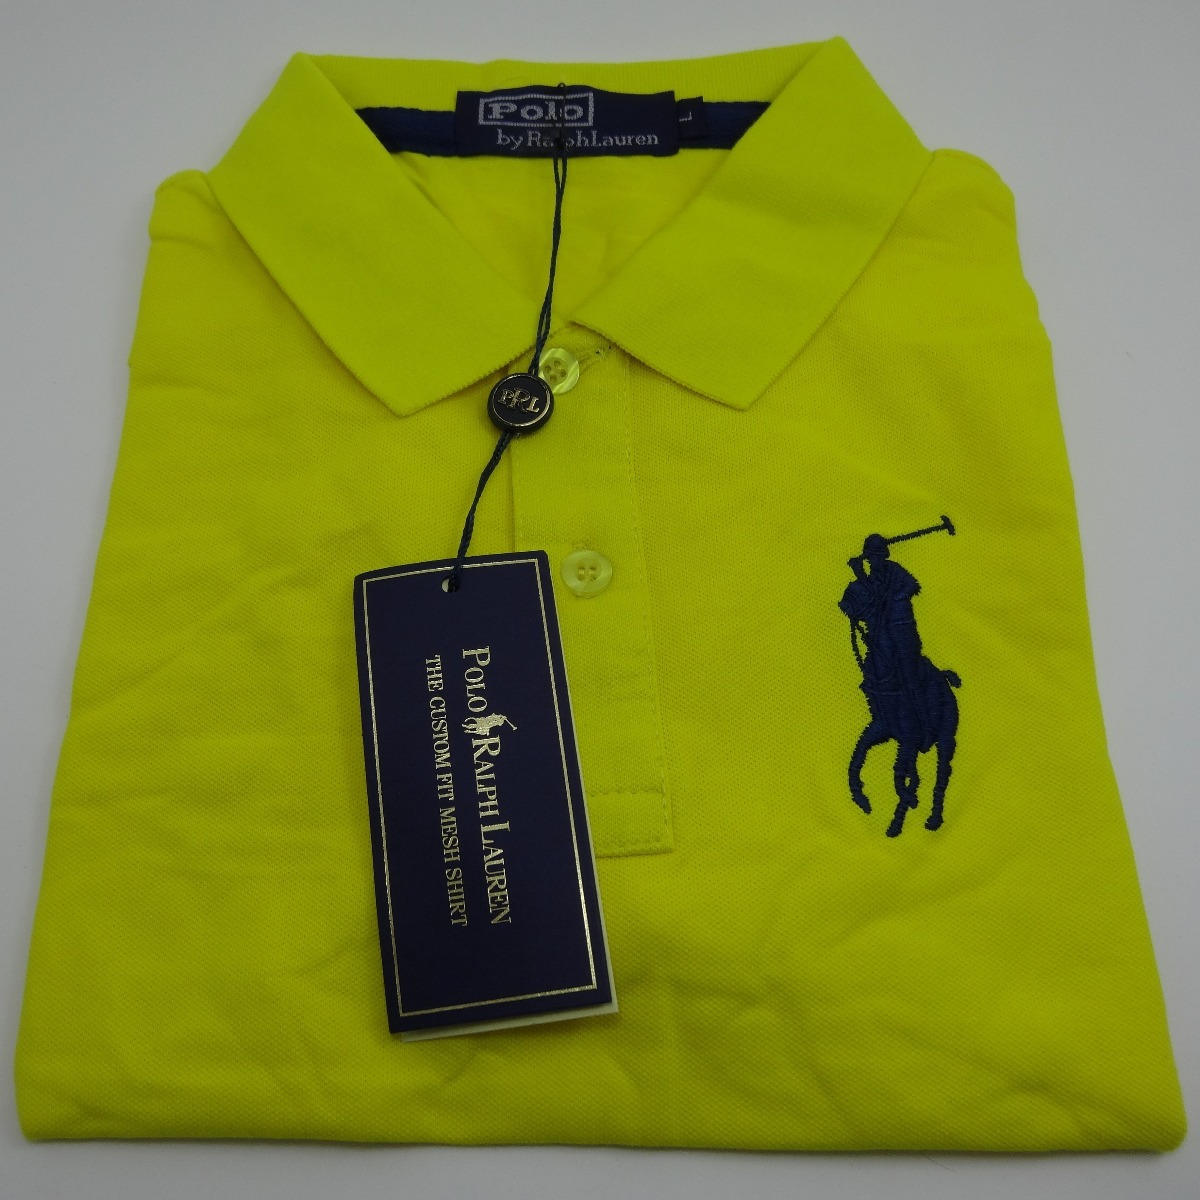 ff902db189232 Playeras Polo Ralph Lauren Classic Custom Fit Polos Varios ...